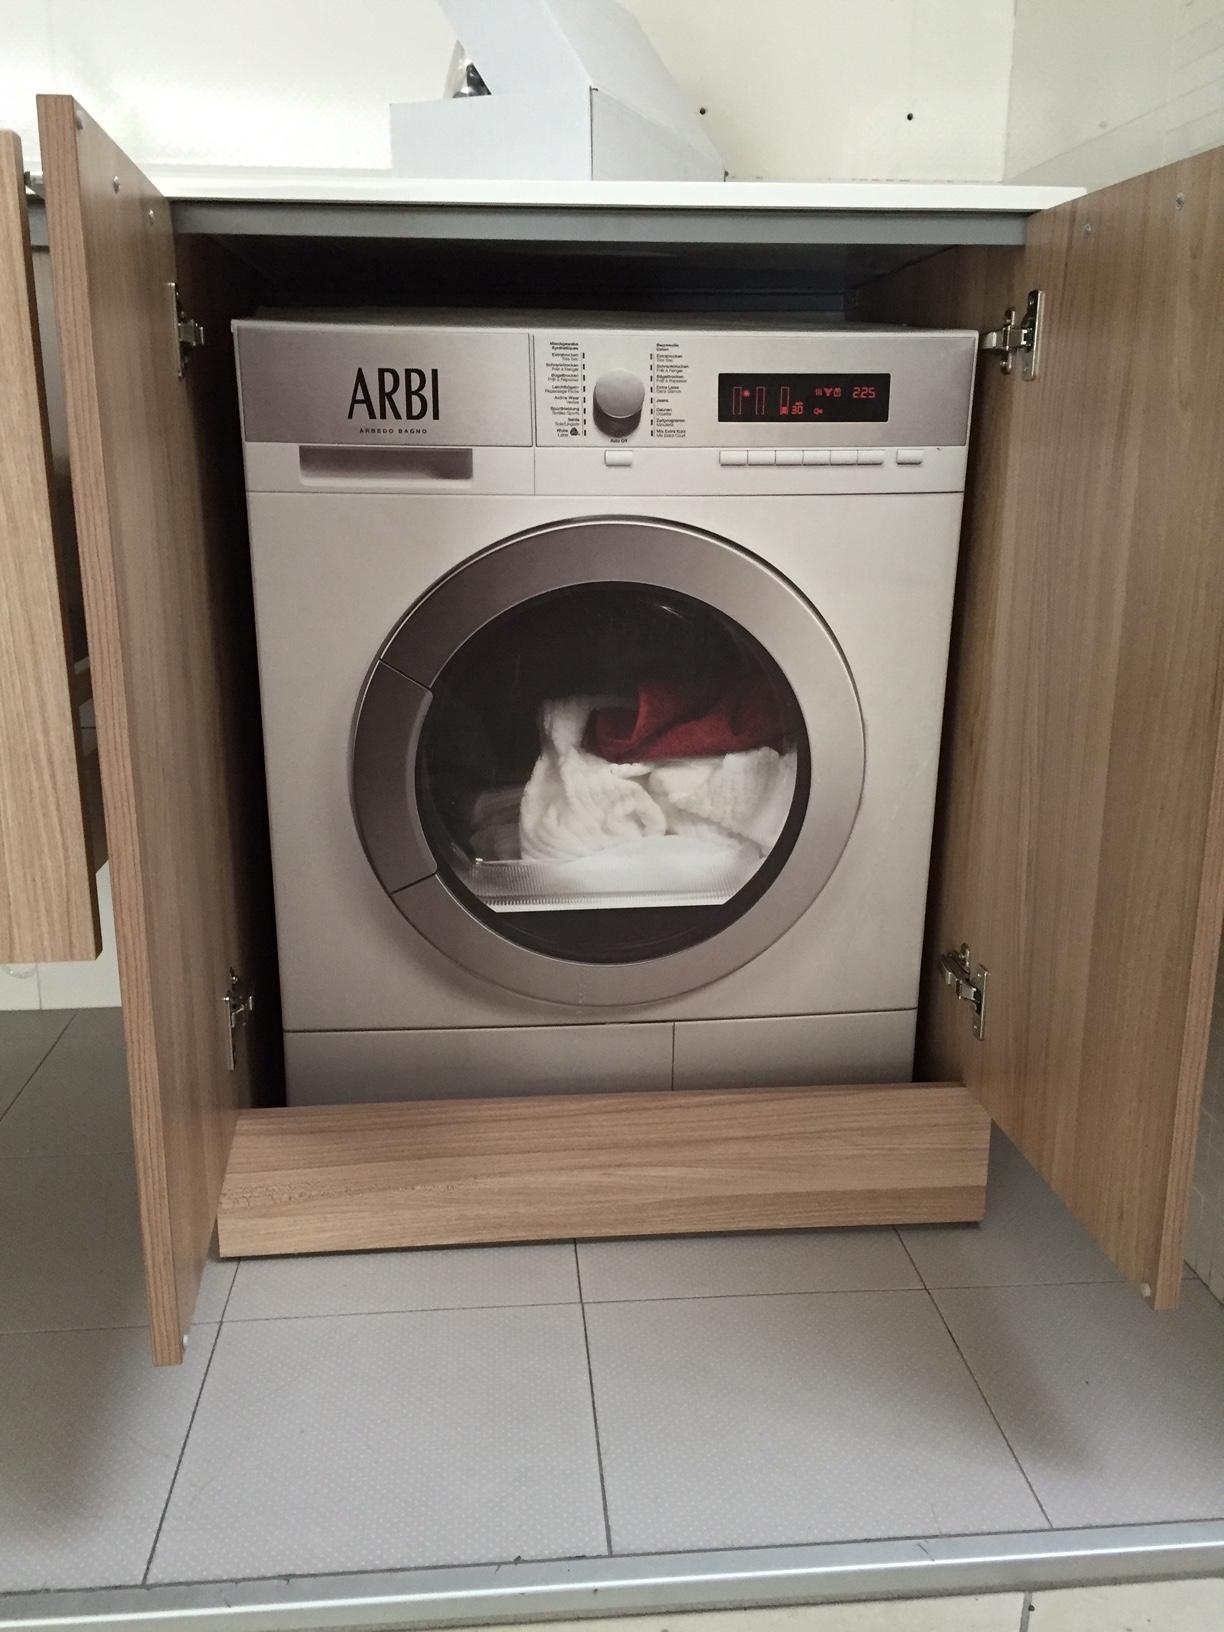 Mobili bagno lavanderia elegant mobili bagno lavanderia with mobili bagno lavanderia awesome - Ikea mobili per lavanderia ...